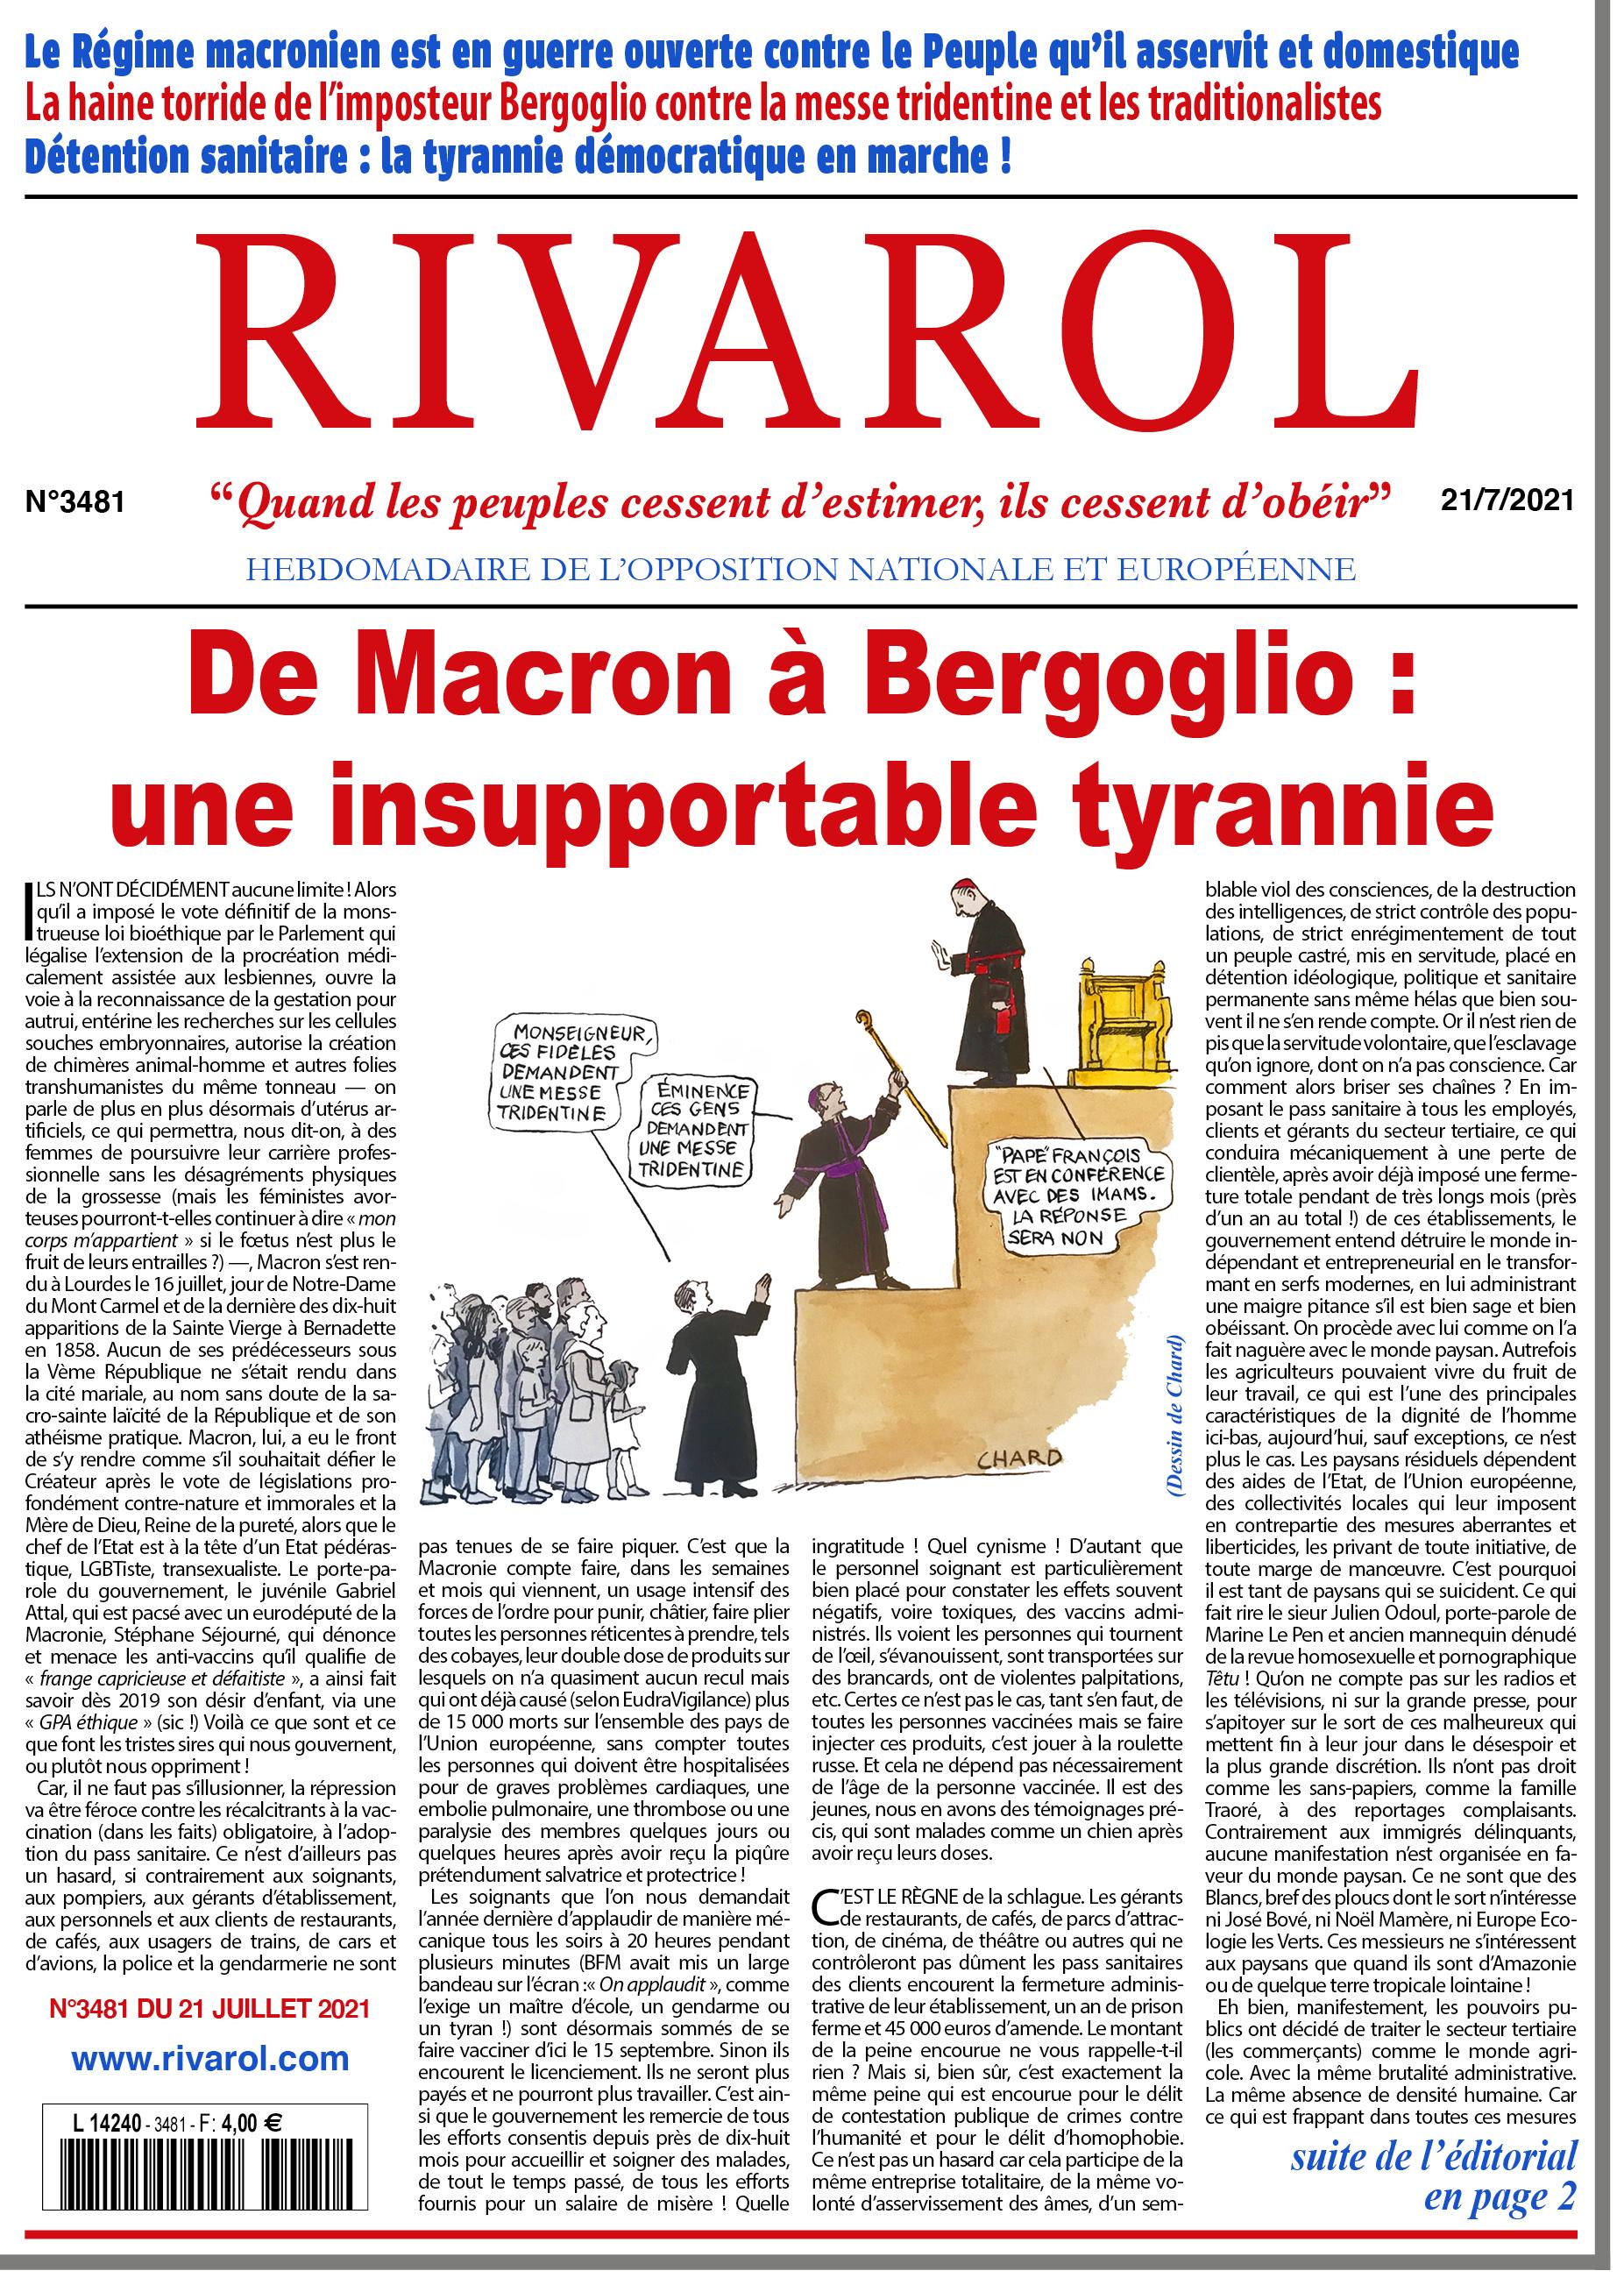 Rivarol n°3481 du 21/7/2021